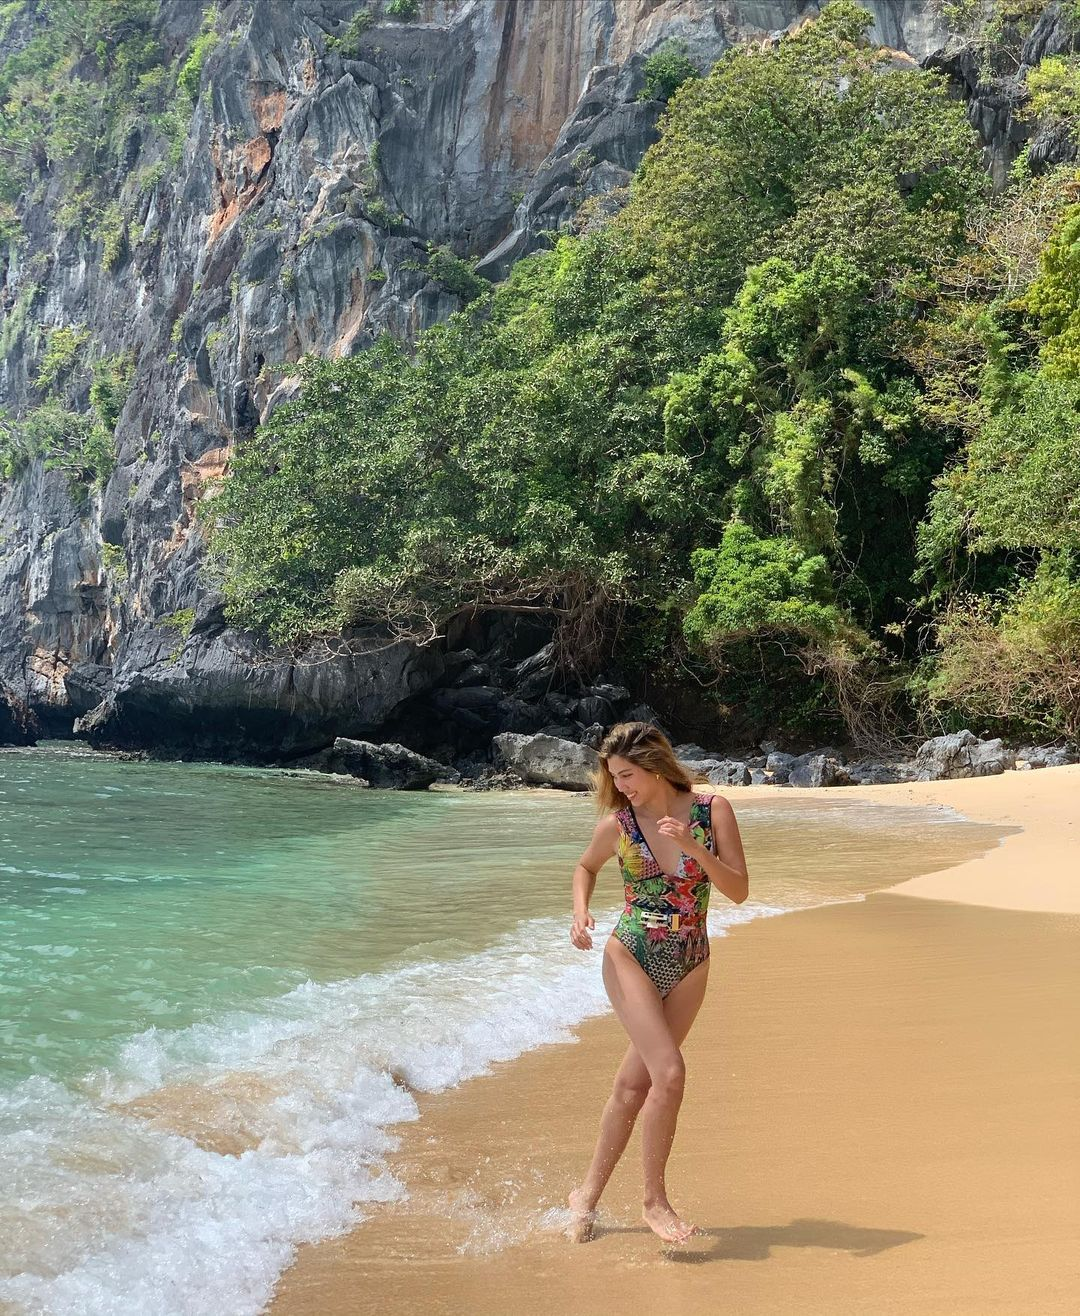 nicole cordoves beach ootds